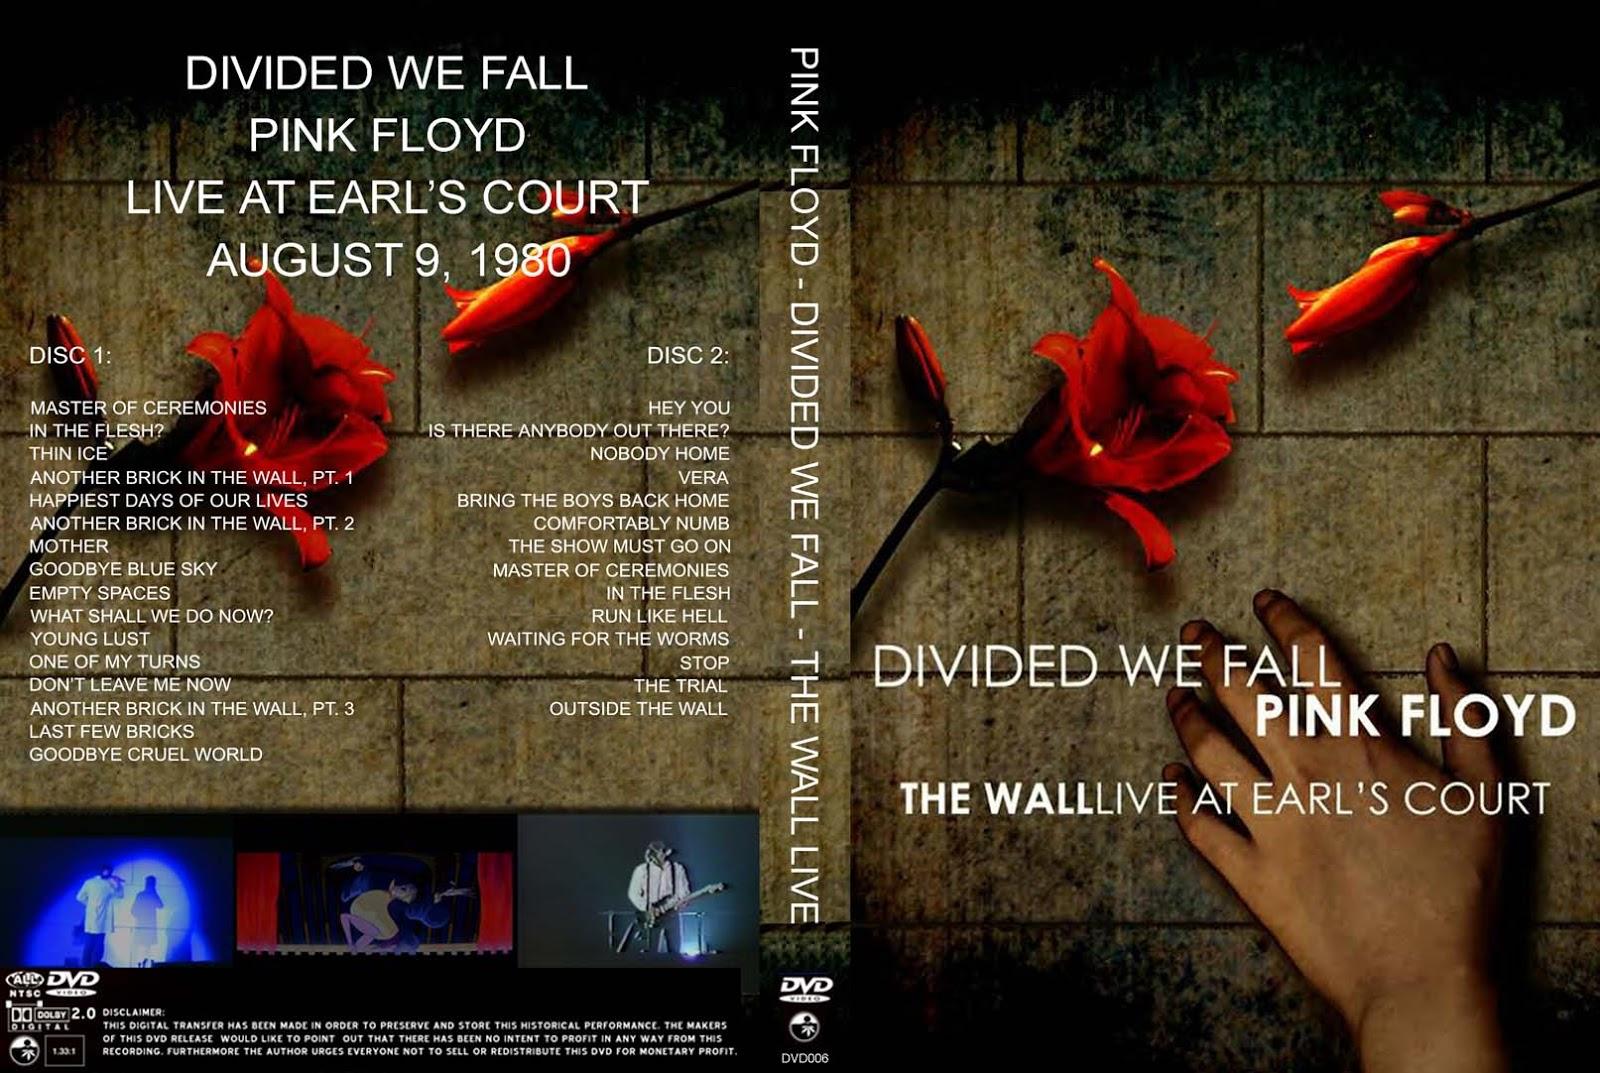 Deer 5001: Pink Floyd - Divided We Fall HRV 2xDVD